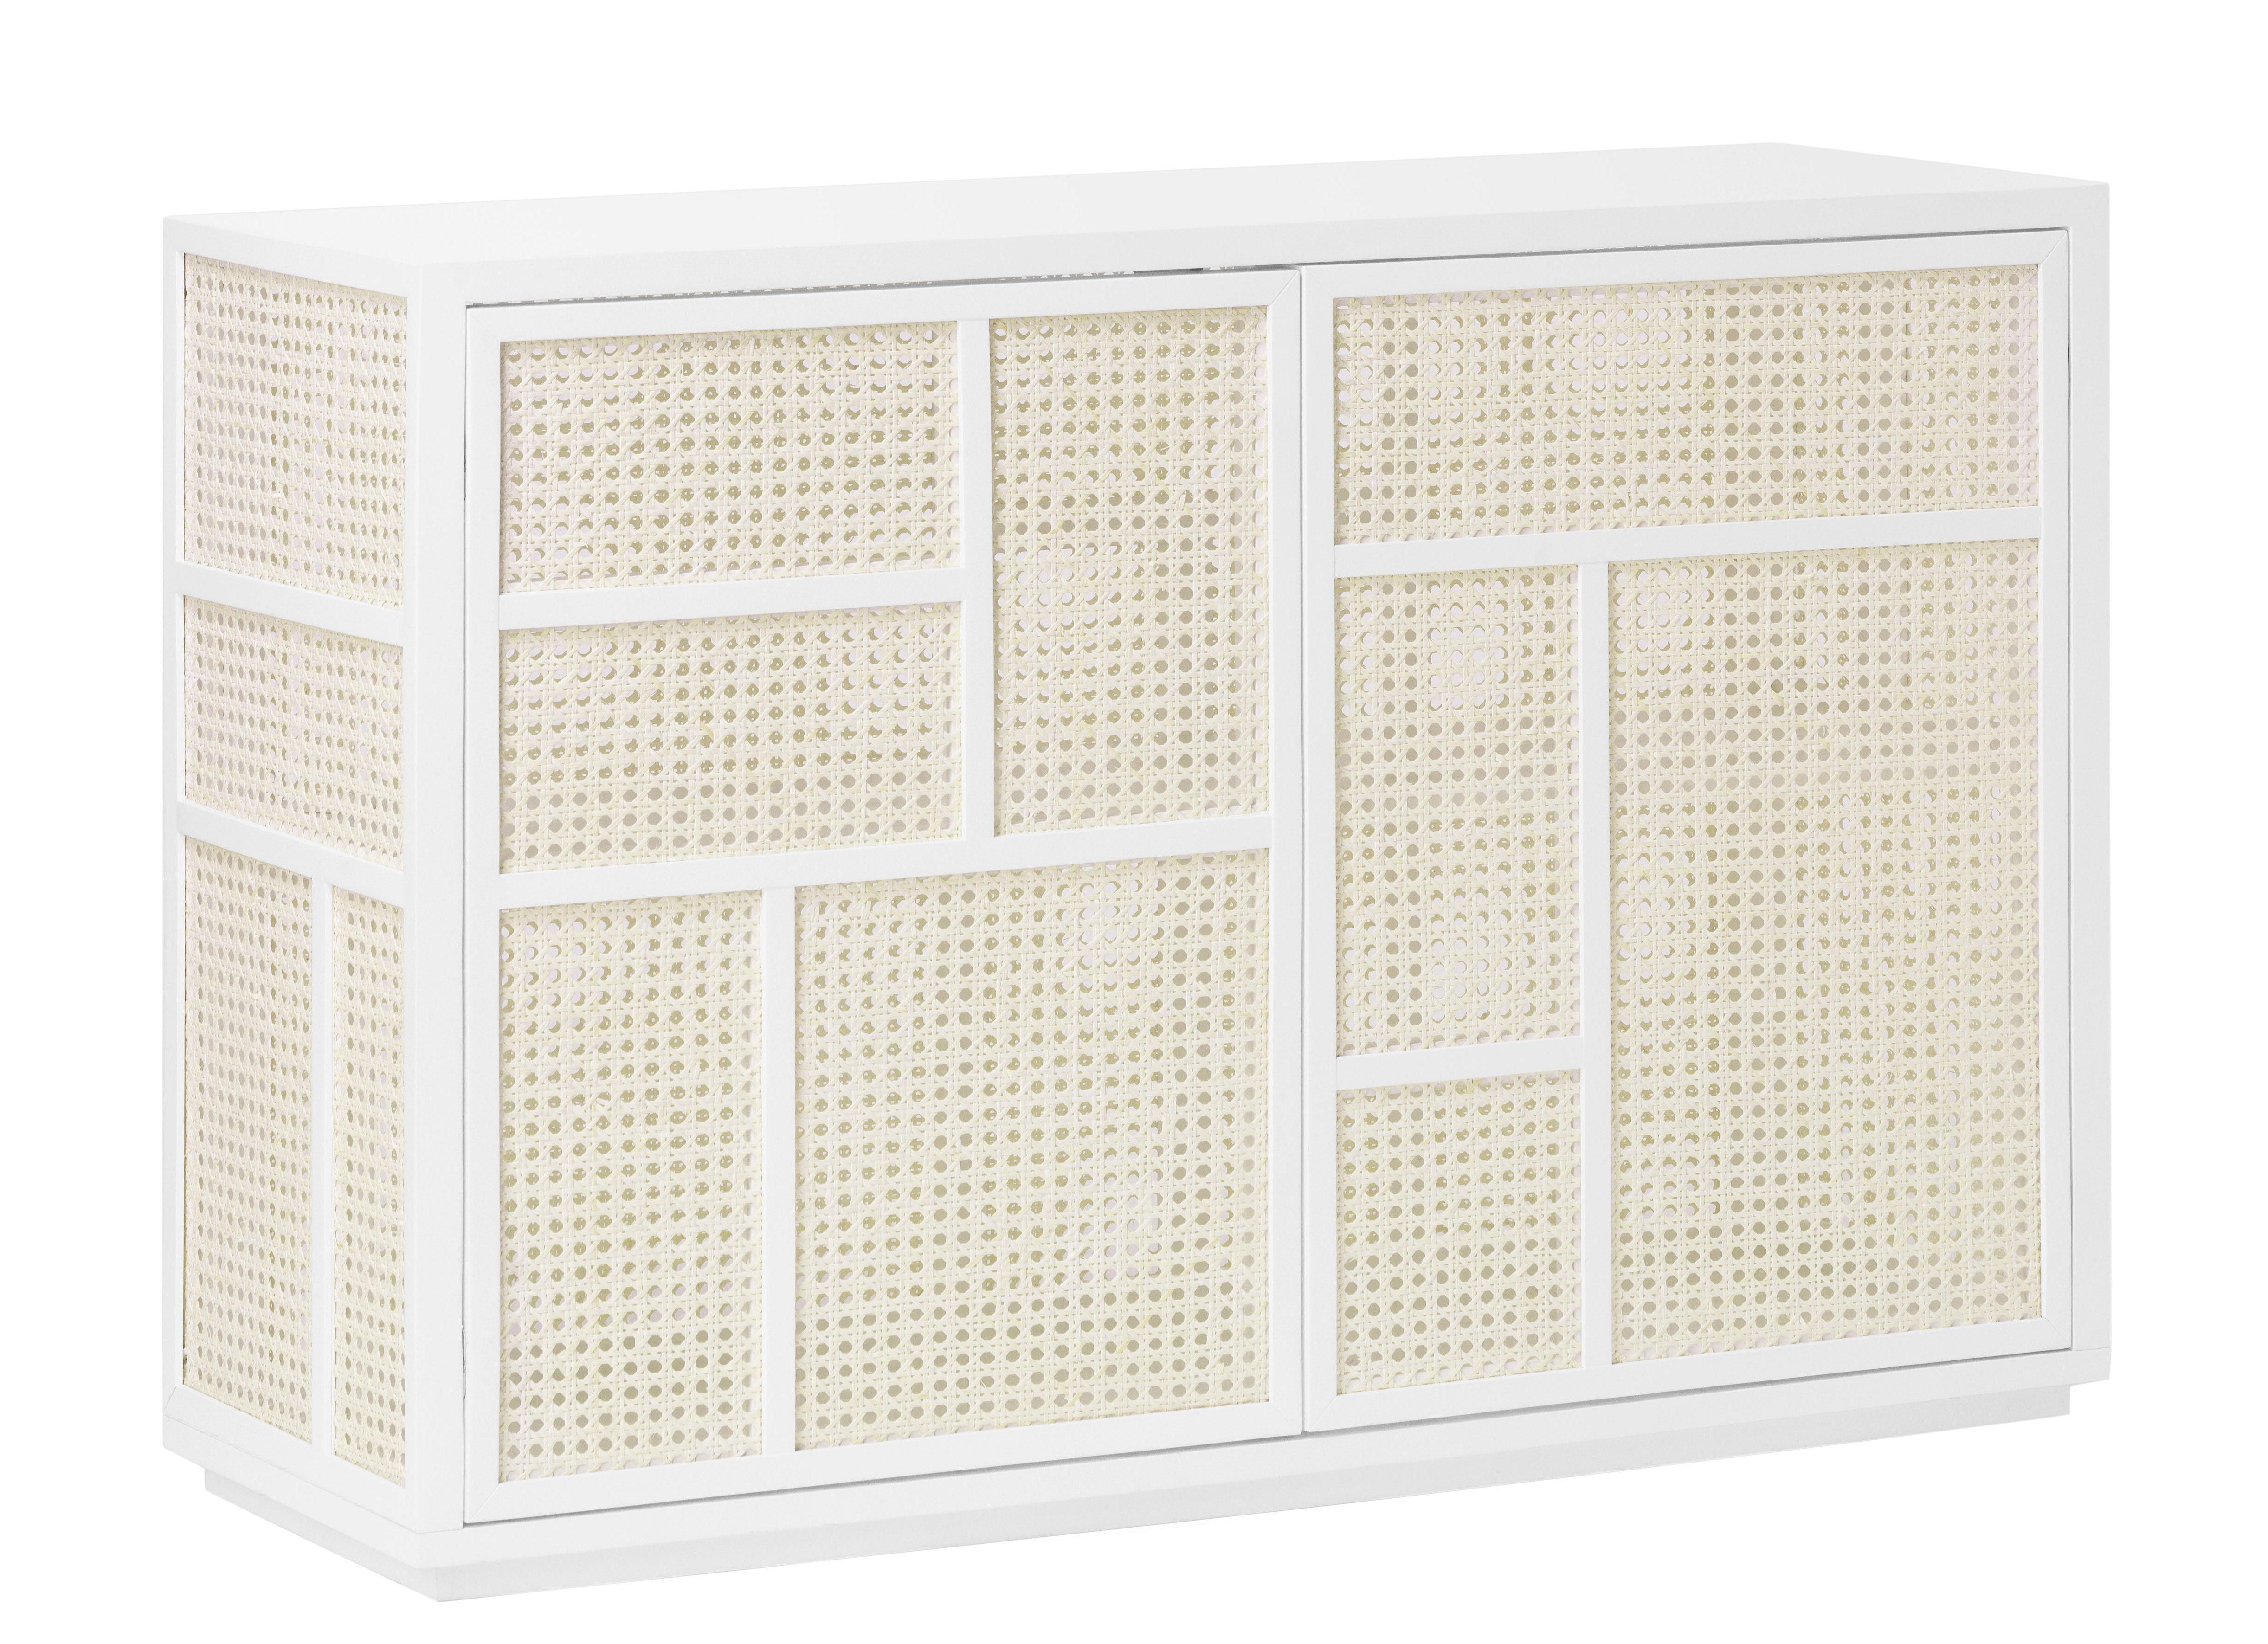 Arredamento - Contenitori, Credenze... - Buffet basso Air /  Impagliatura bambù - L 120 x H 81 cm - Design House Stockholm - Bianco & bambù naturale - Betulla, MDF, Midollino